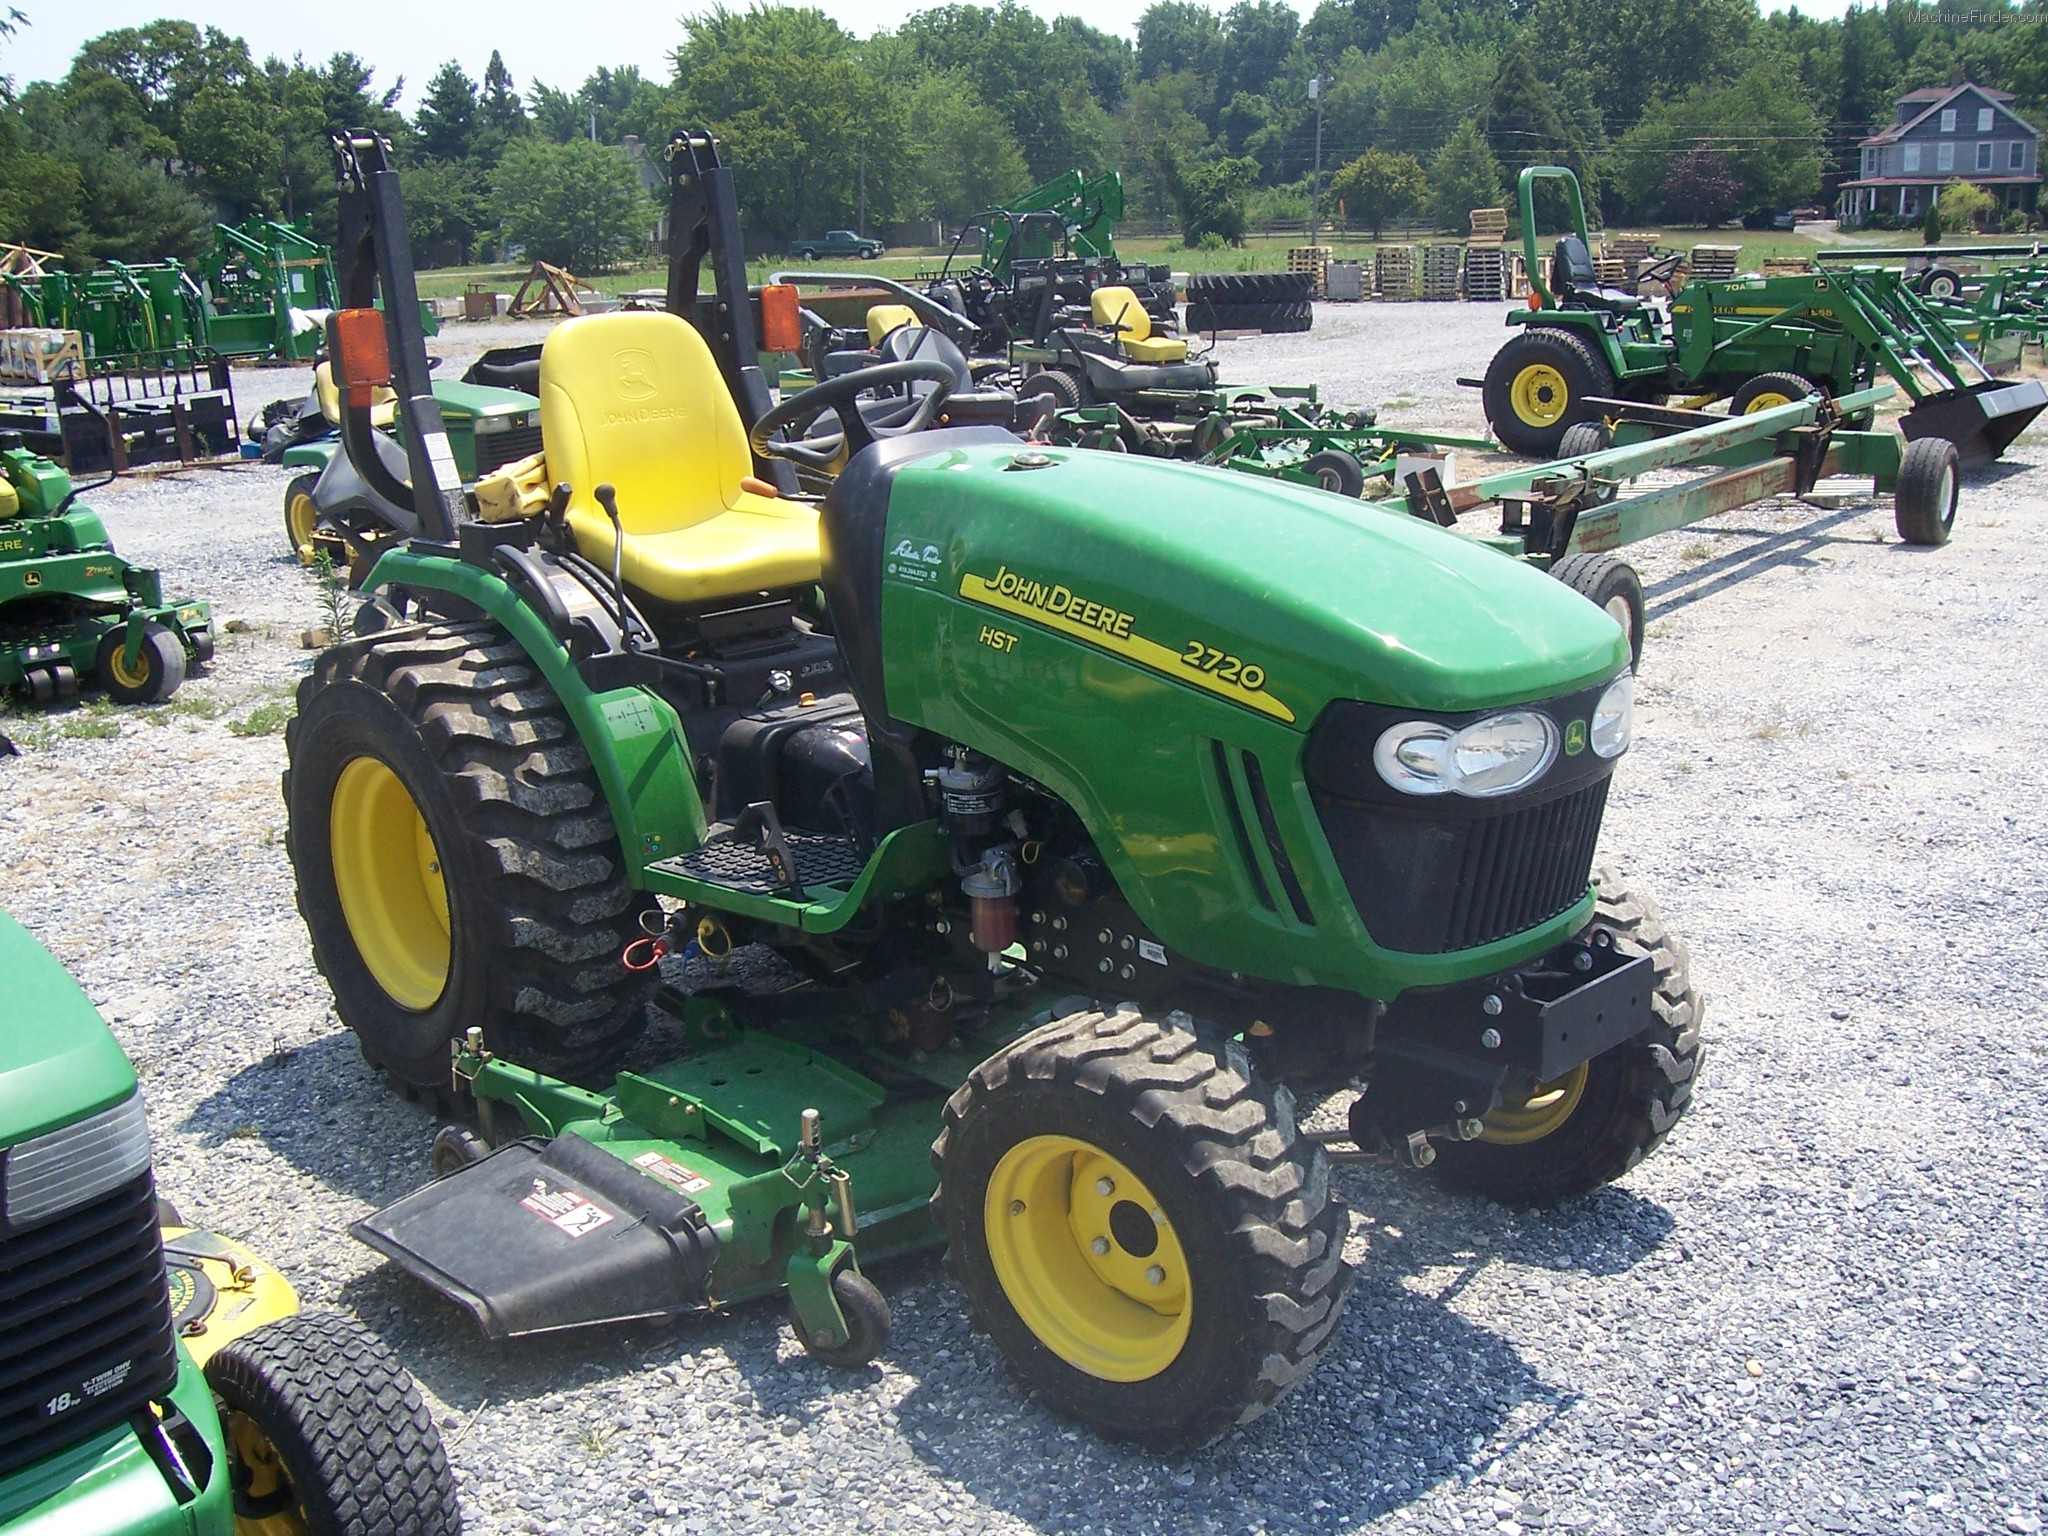 2010 John Deere 2720 Tractors - Compact (1-40hp.) - John ...